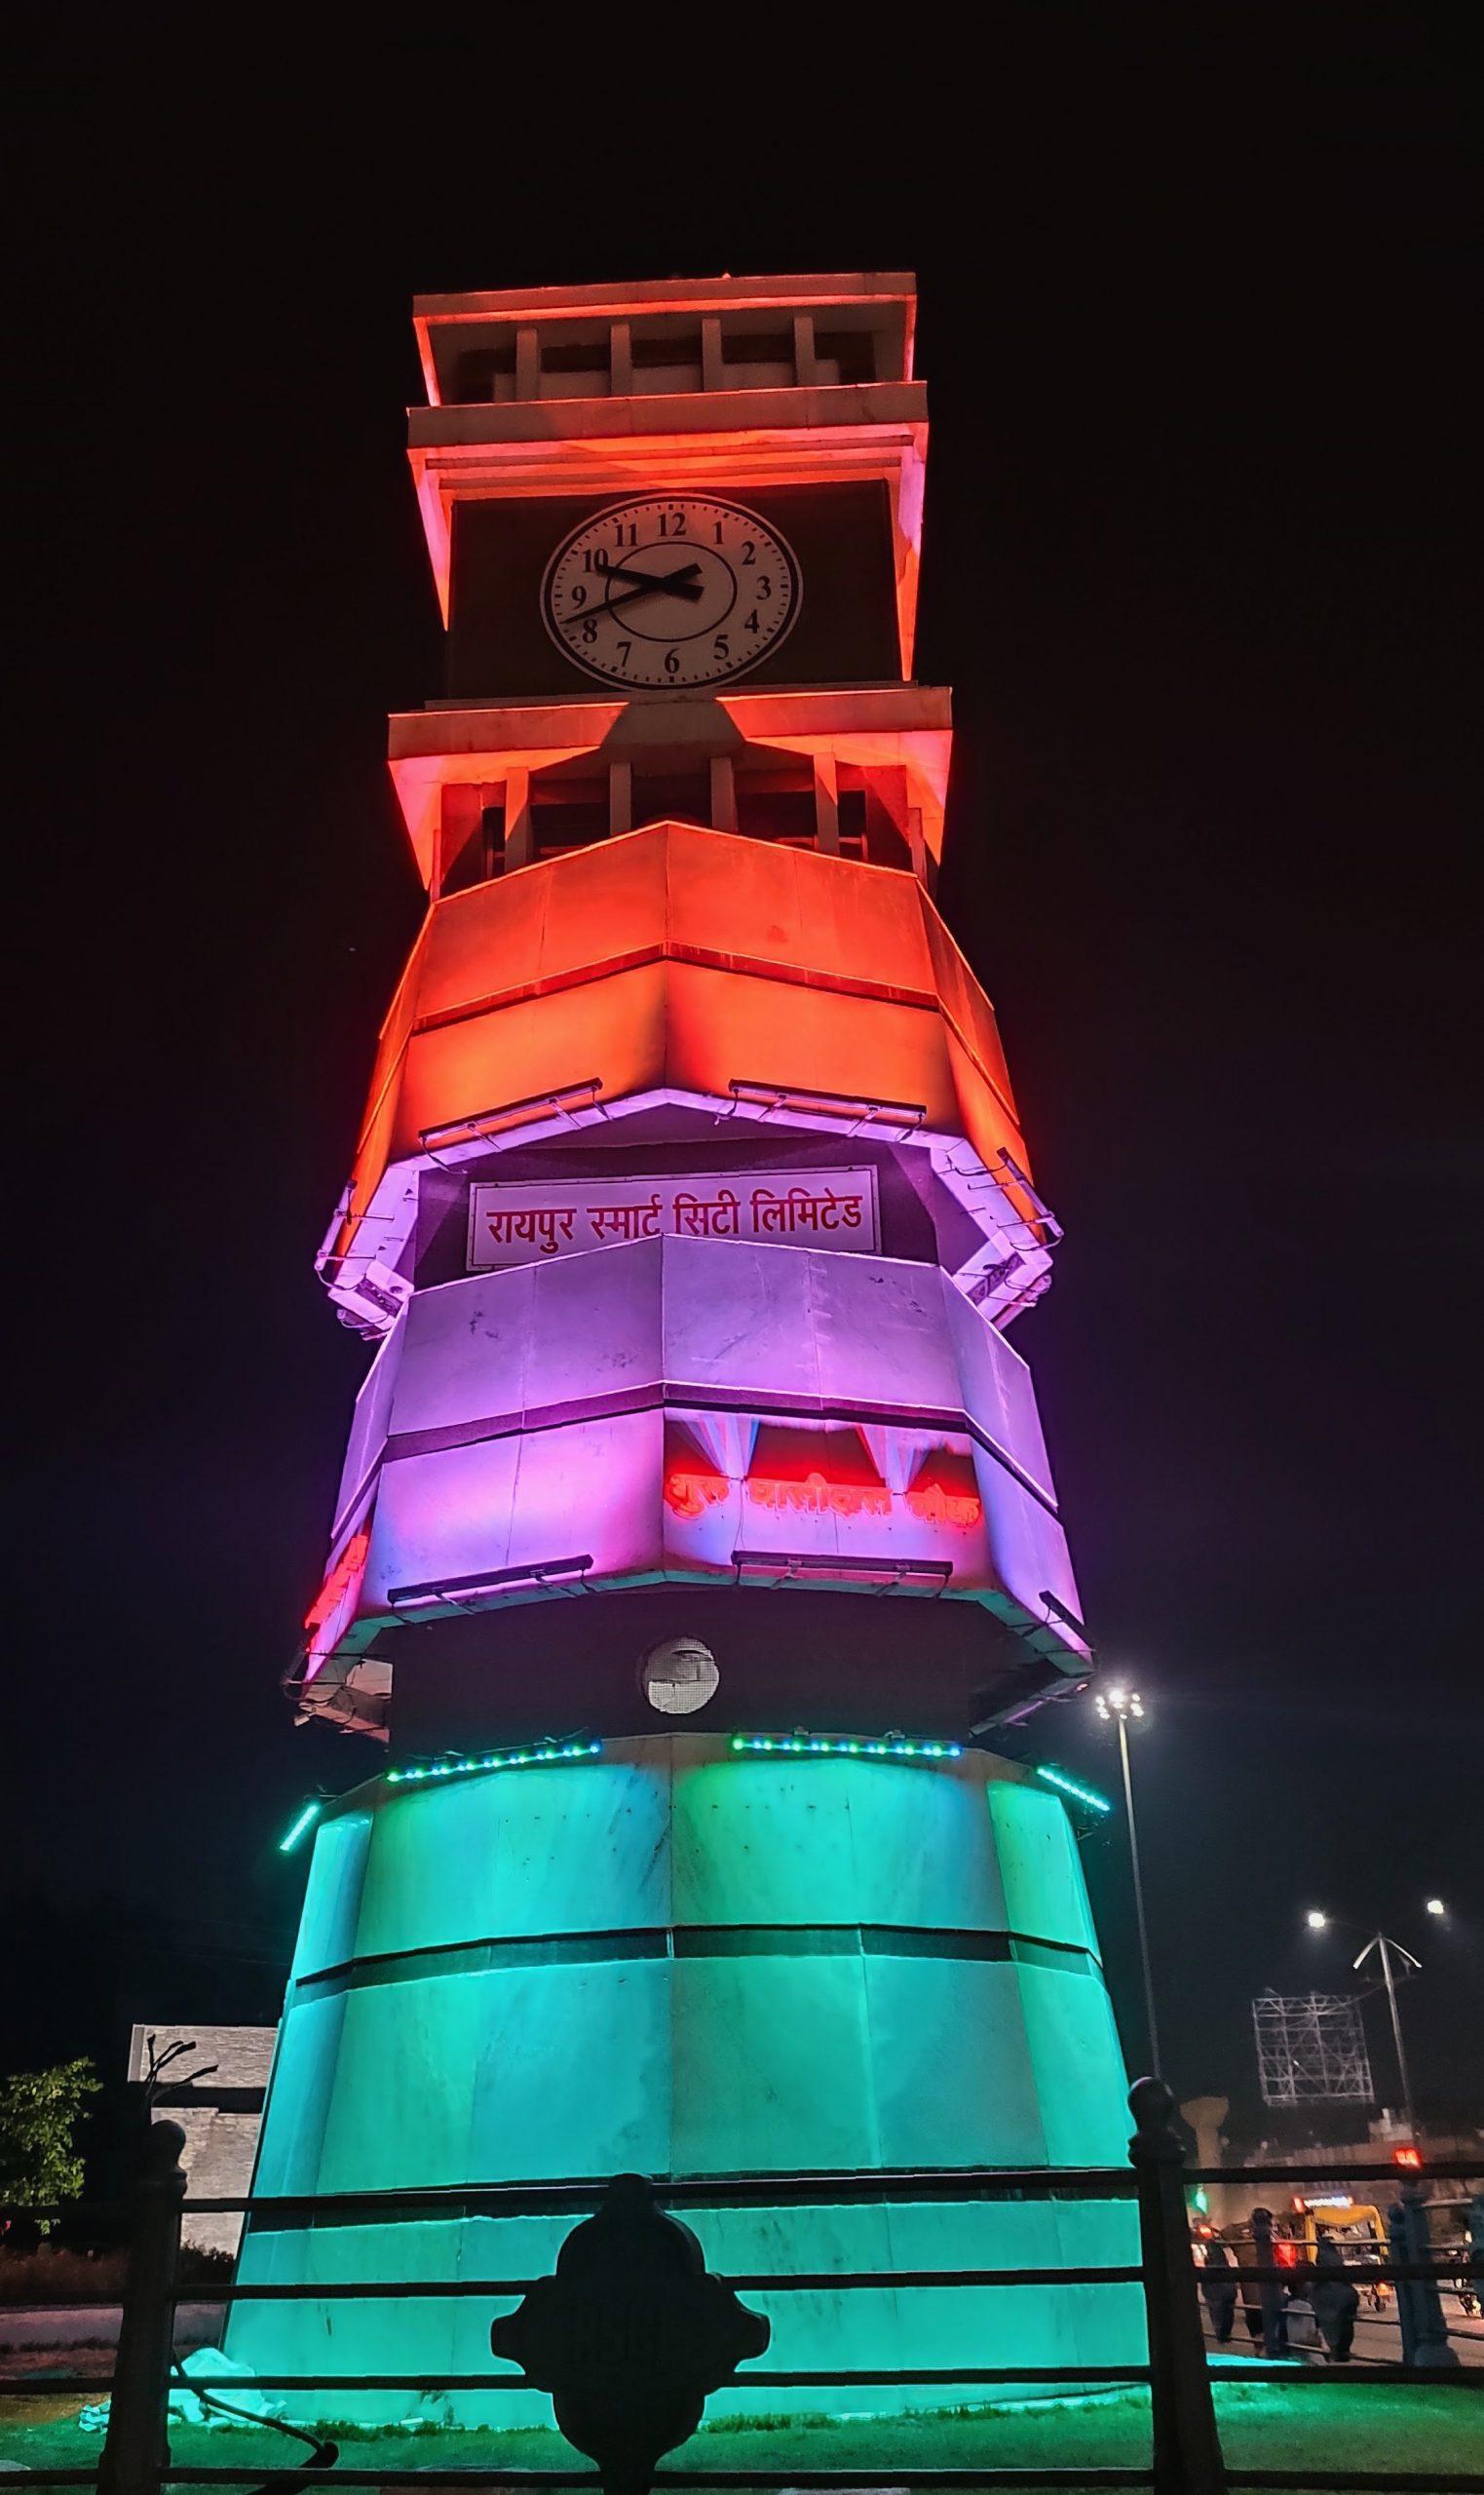 A clock tower